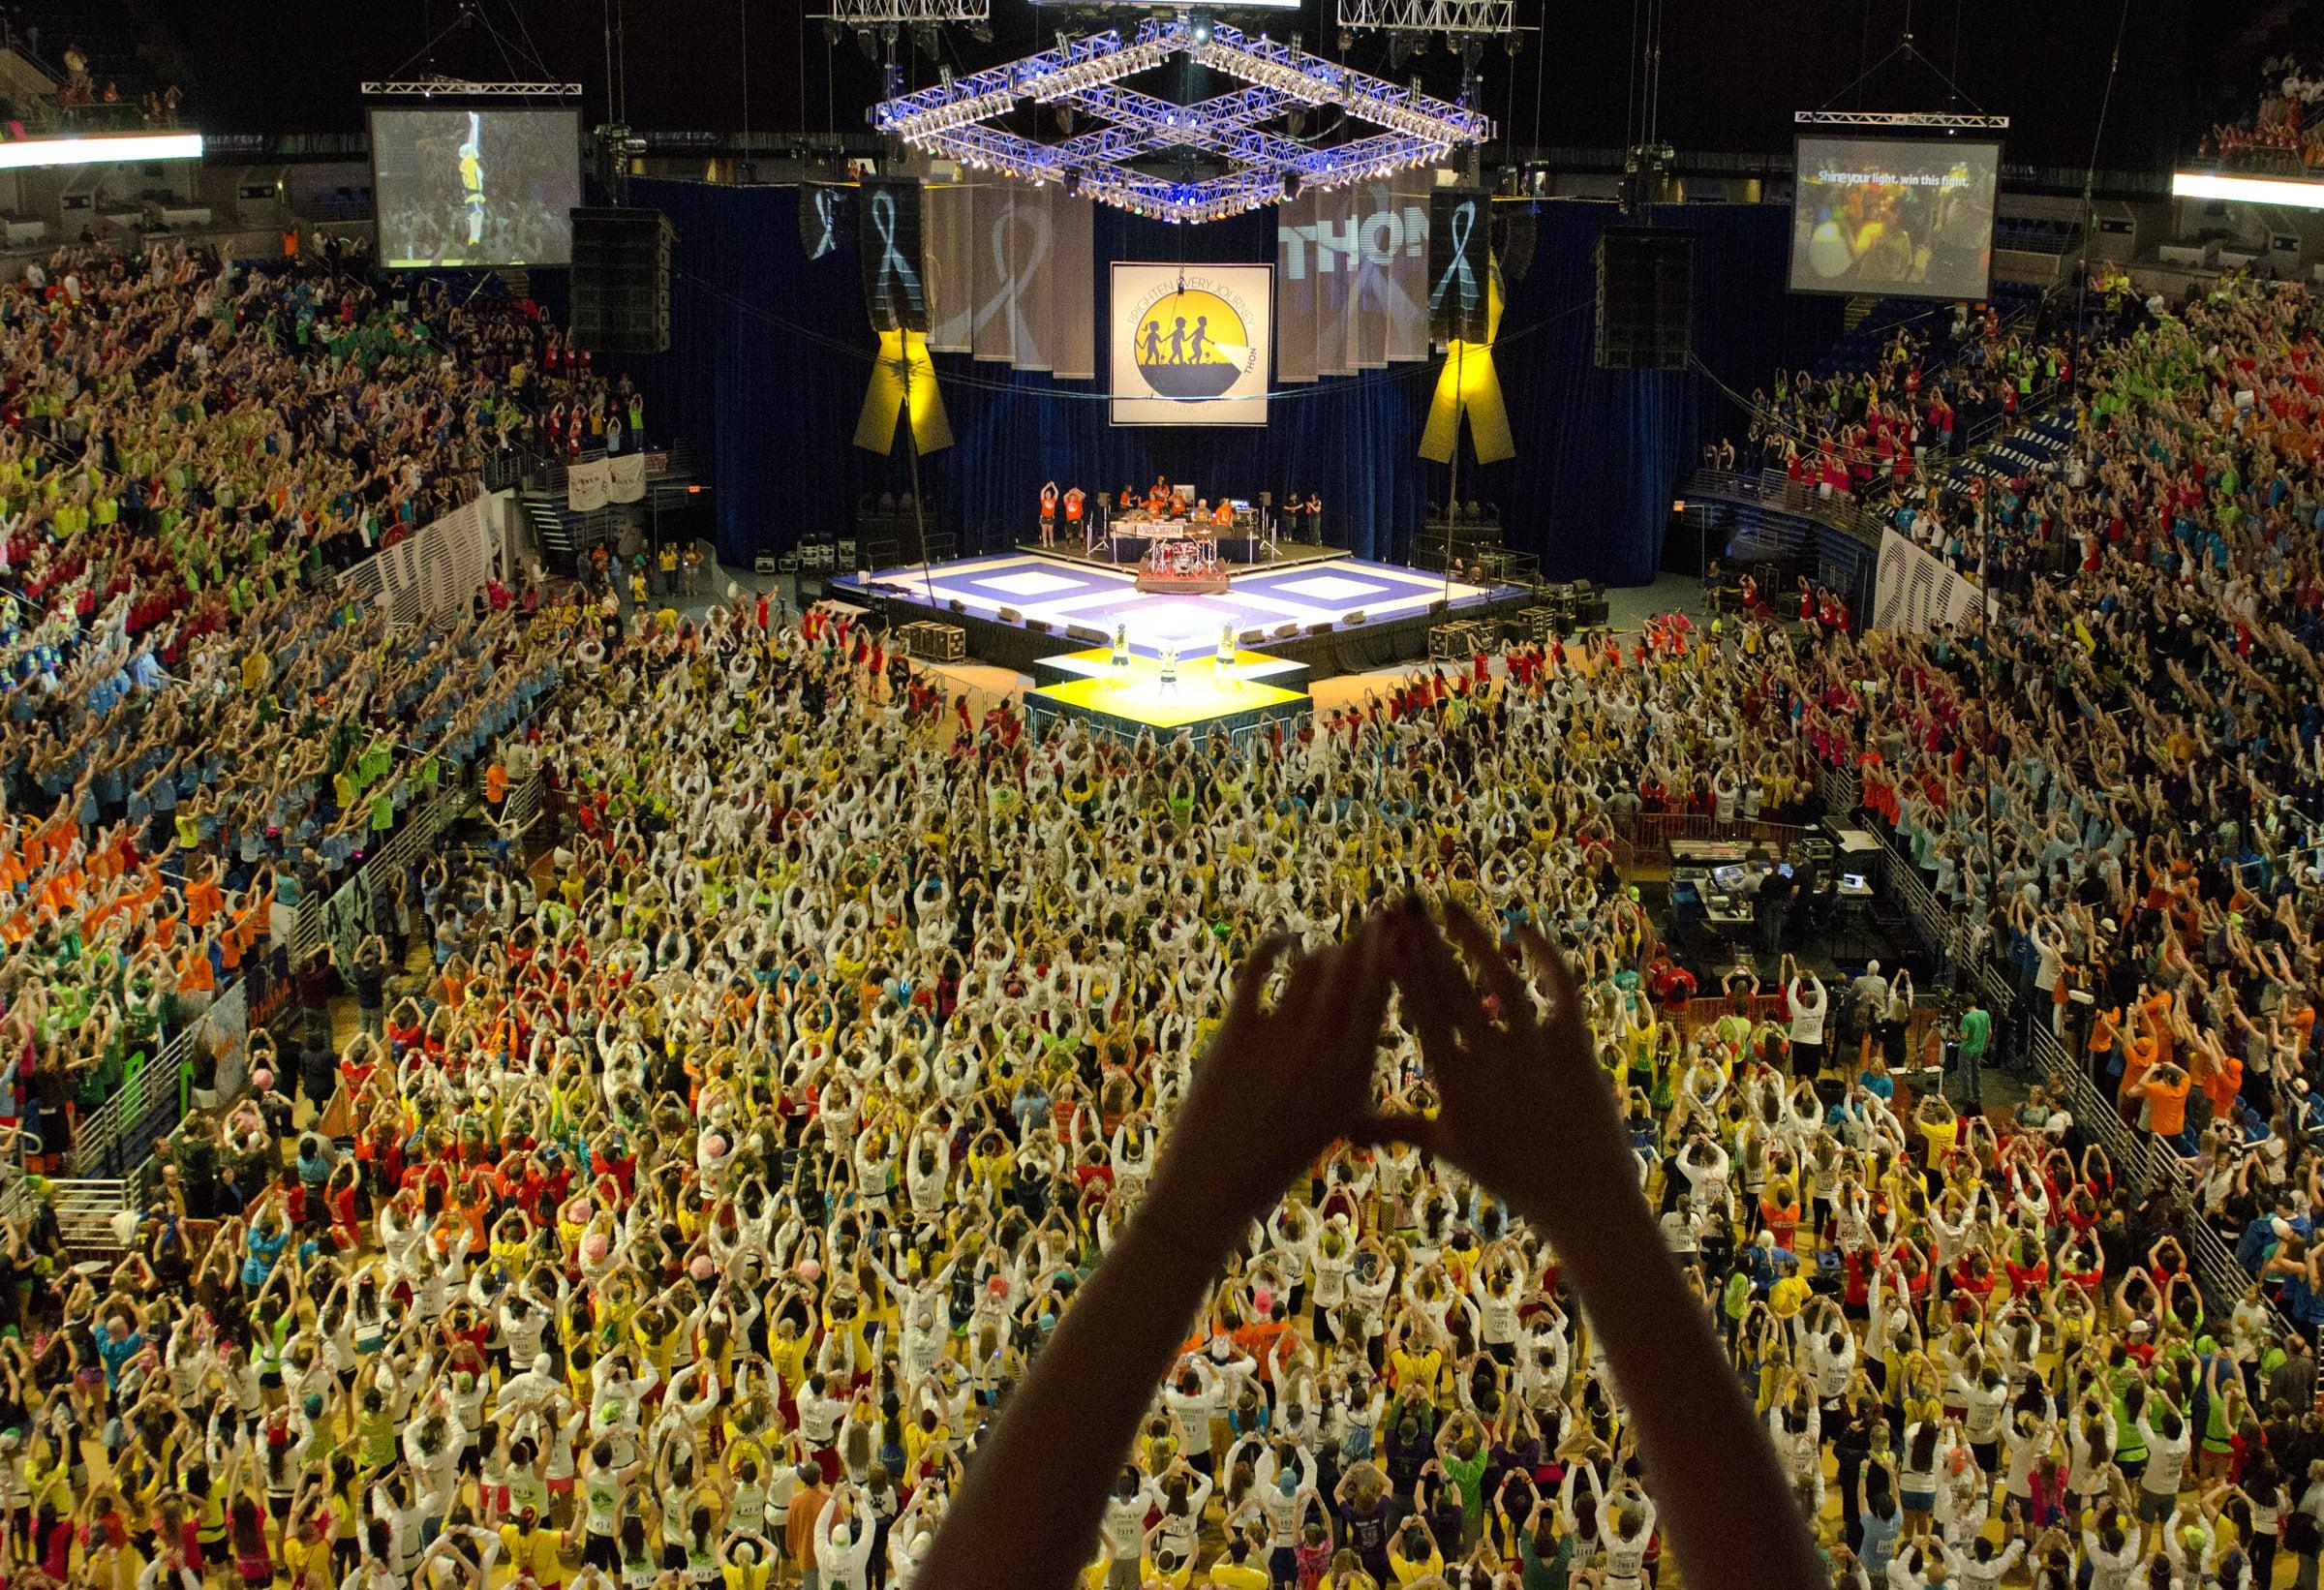 Birds Eye View of The Penn State IFC/Panhellenic Dance Marathon